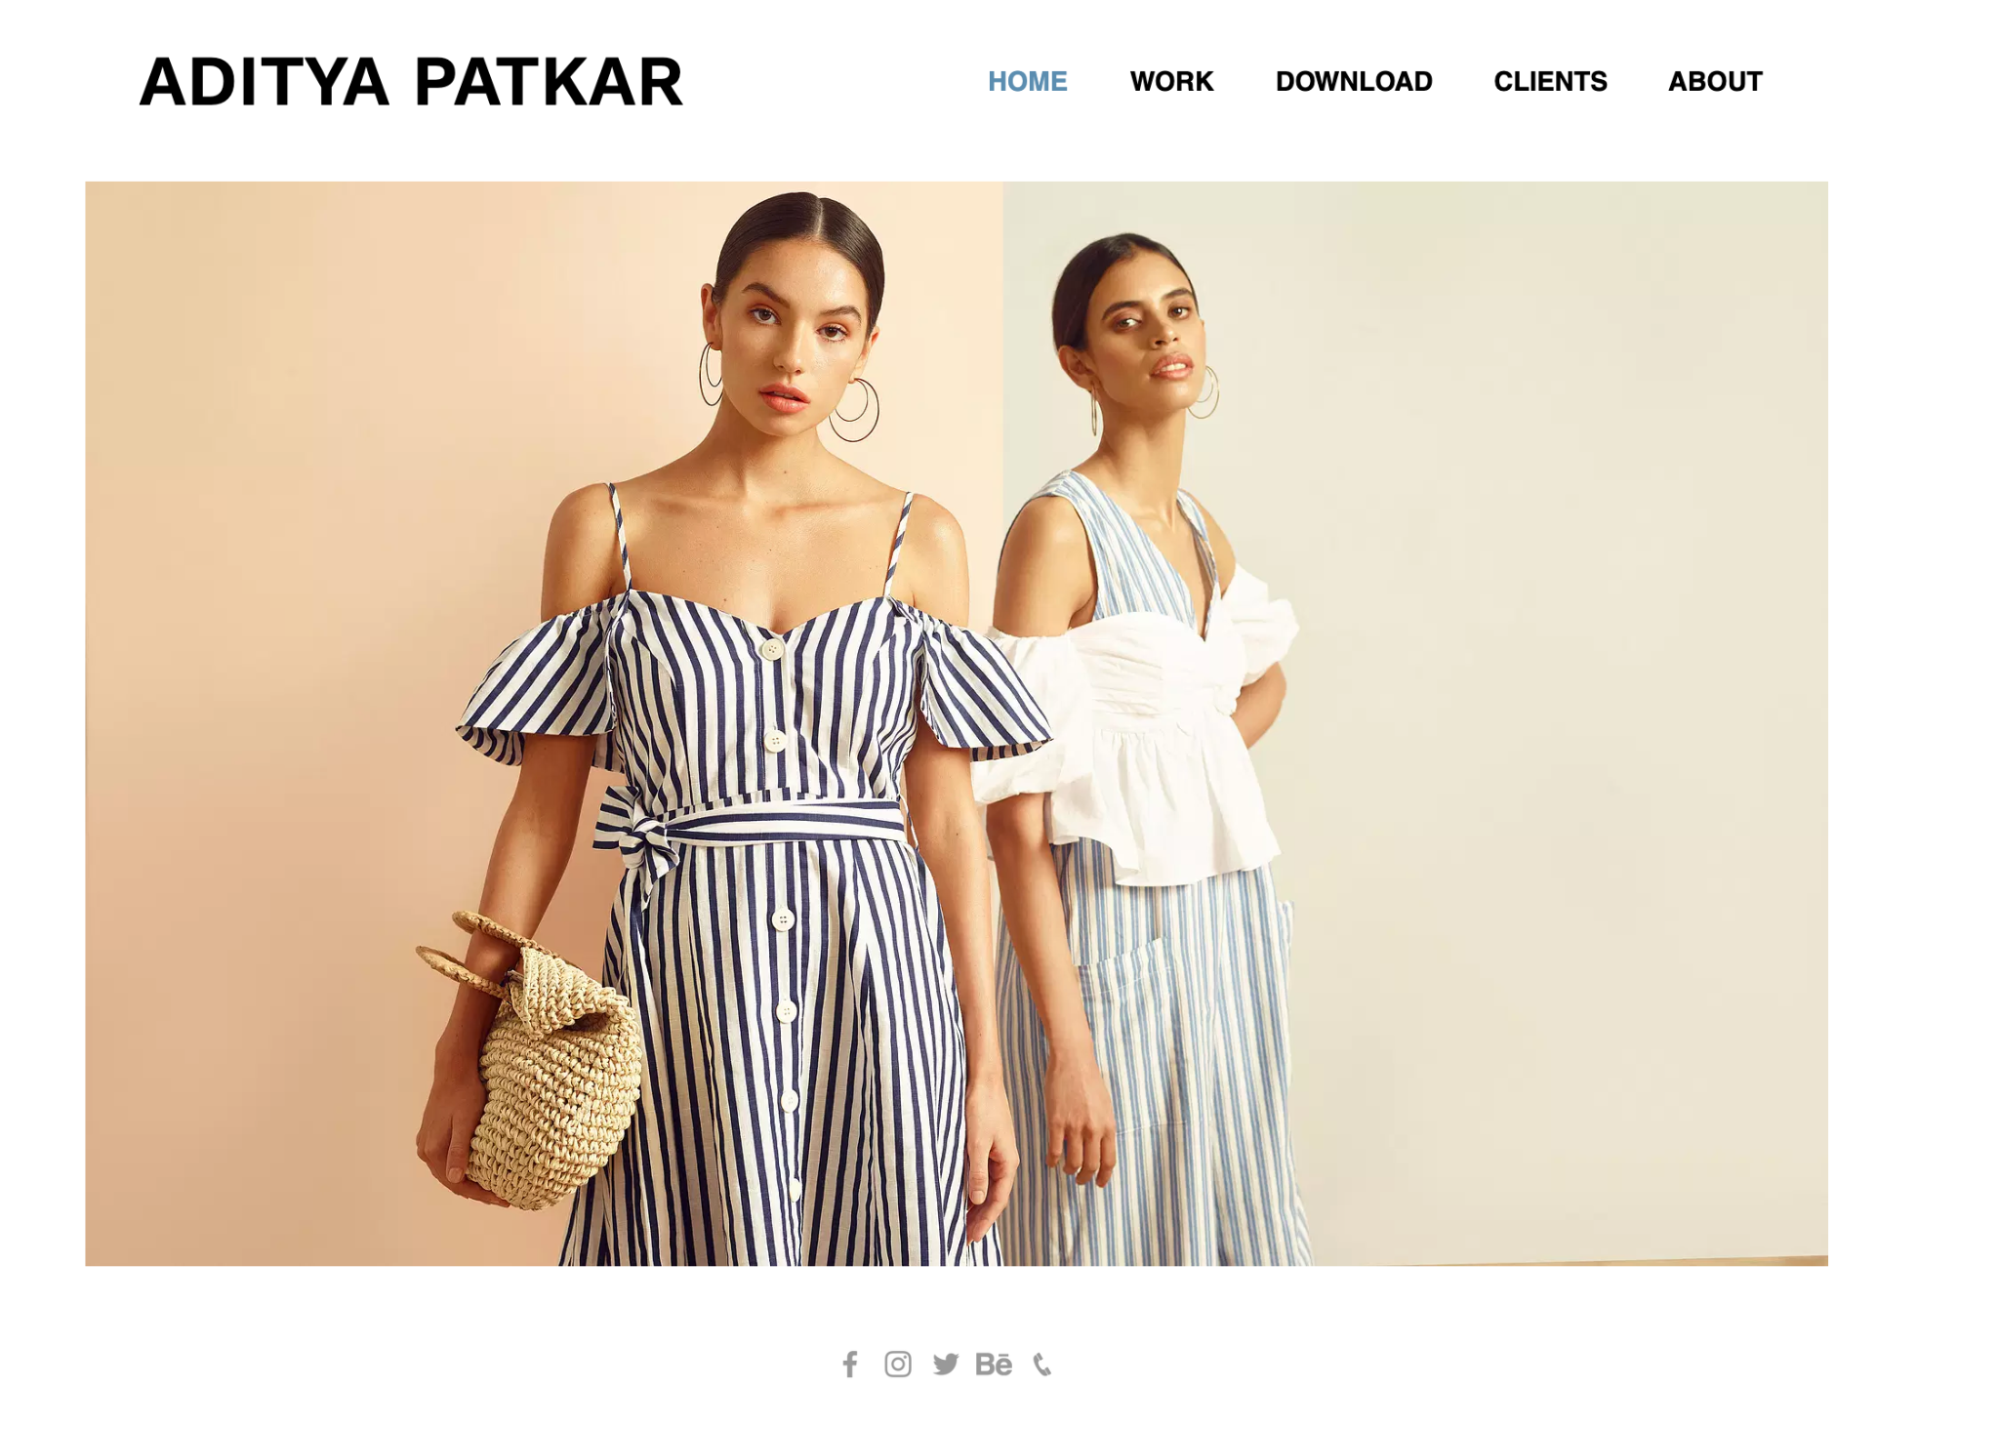 Example of a photography portfolio website.